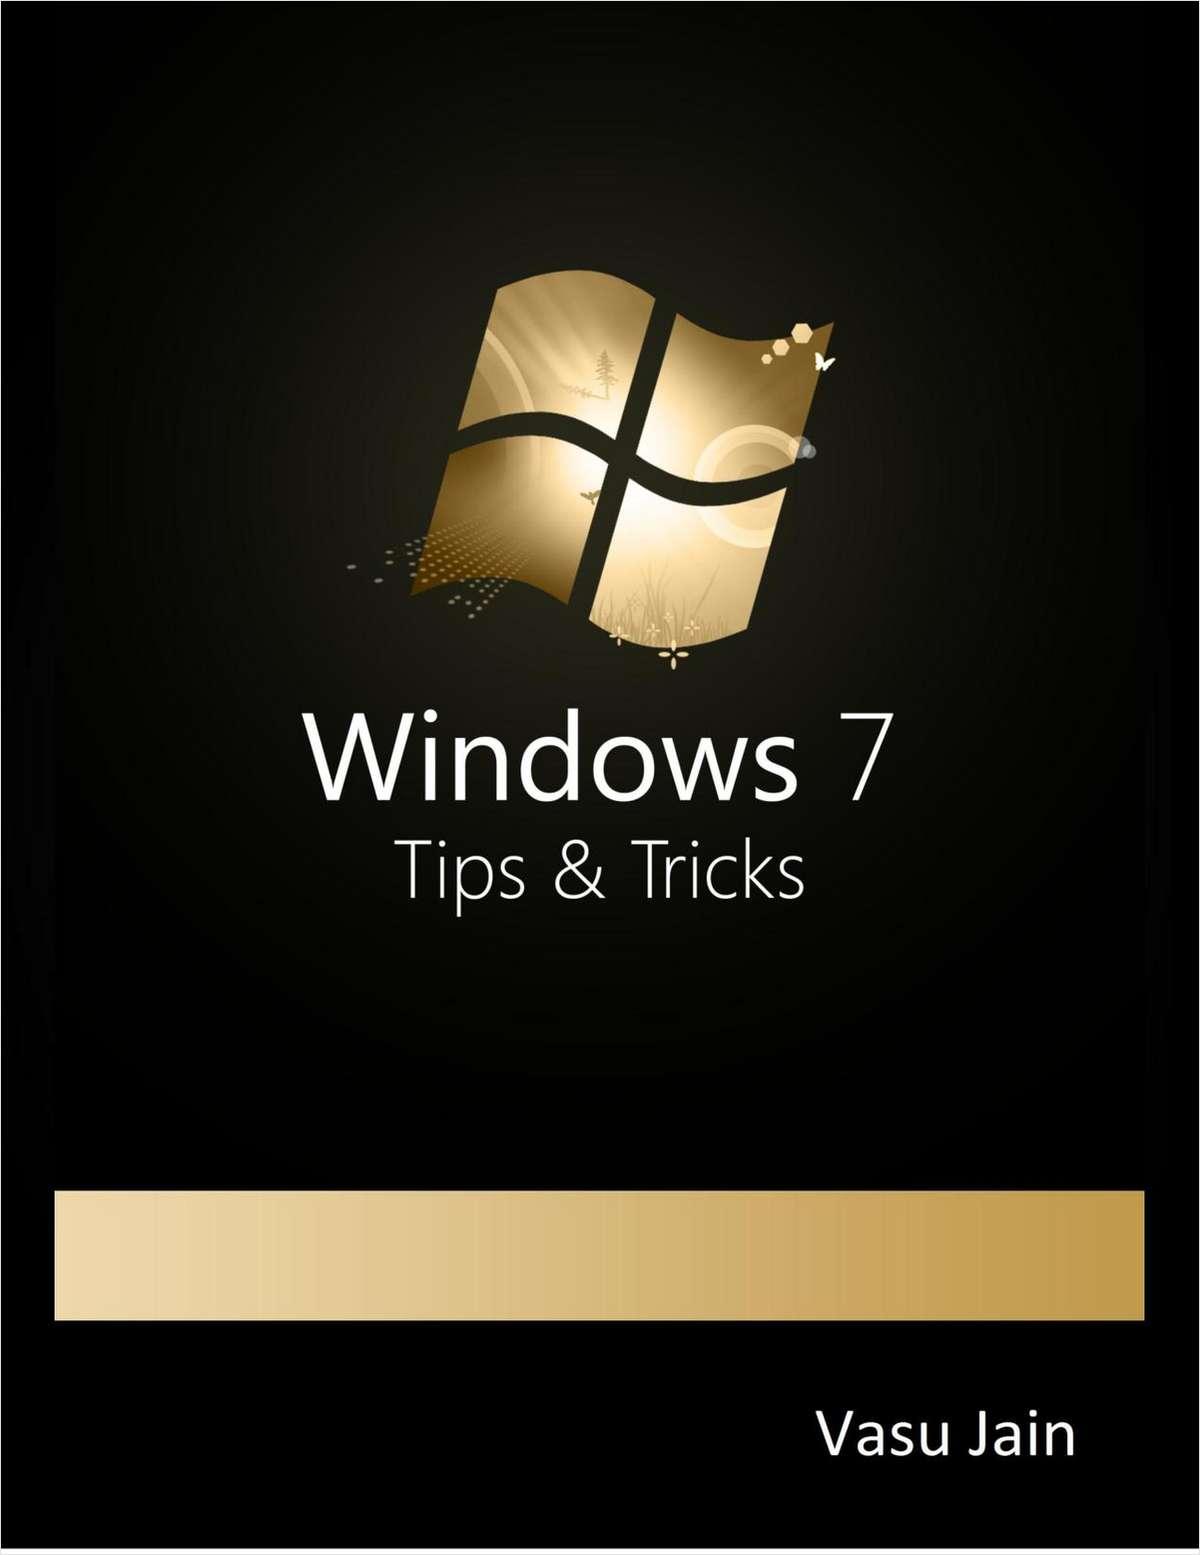 Windows 7: Tips & Tricks